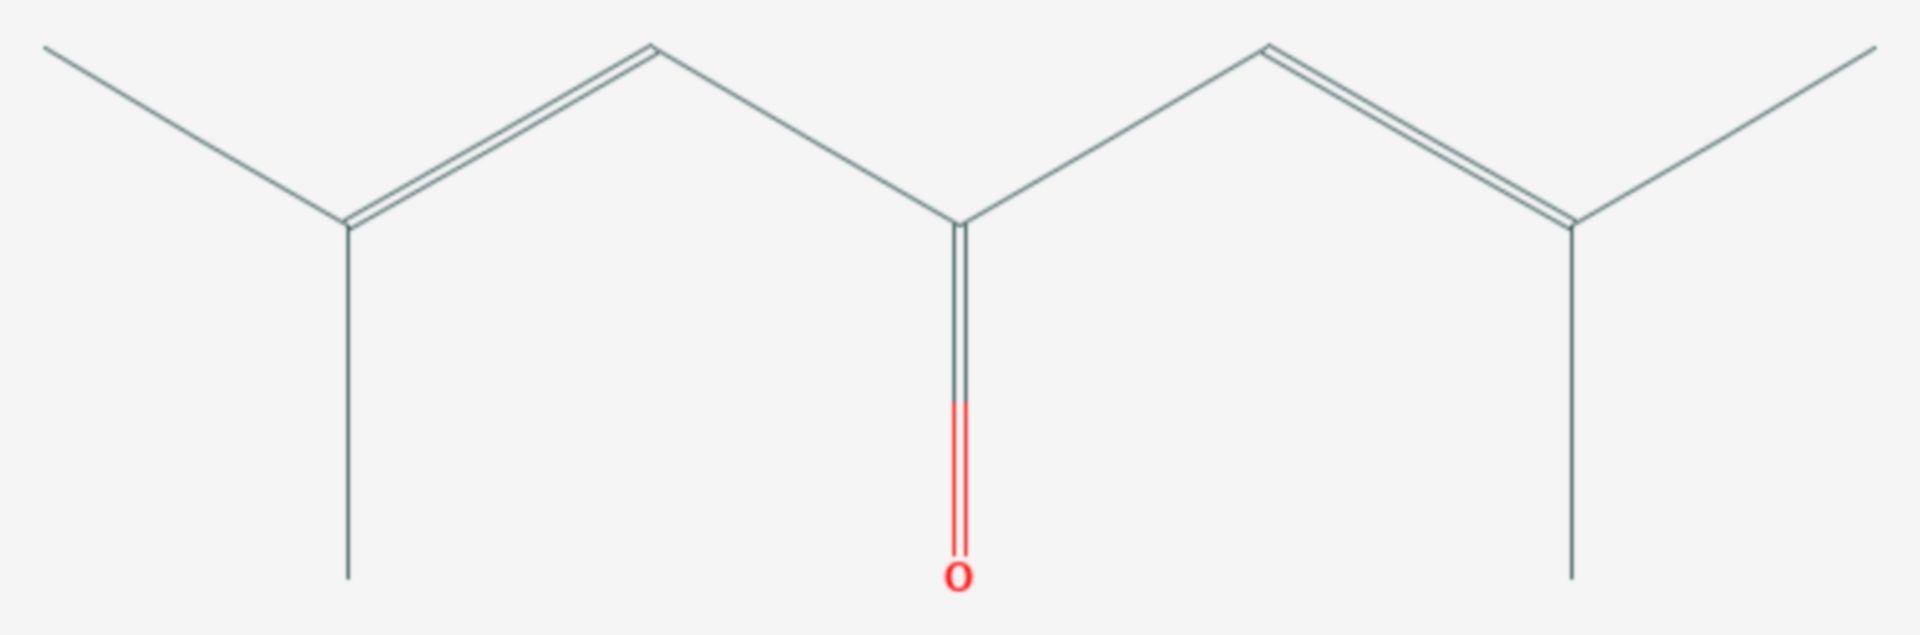 Phoron (Strukturformel)